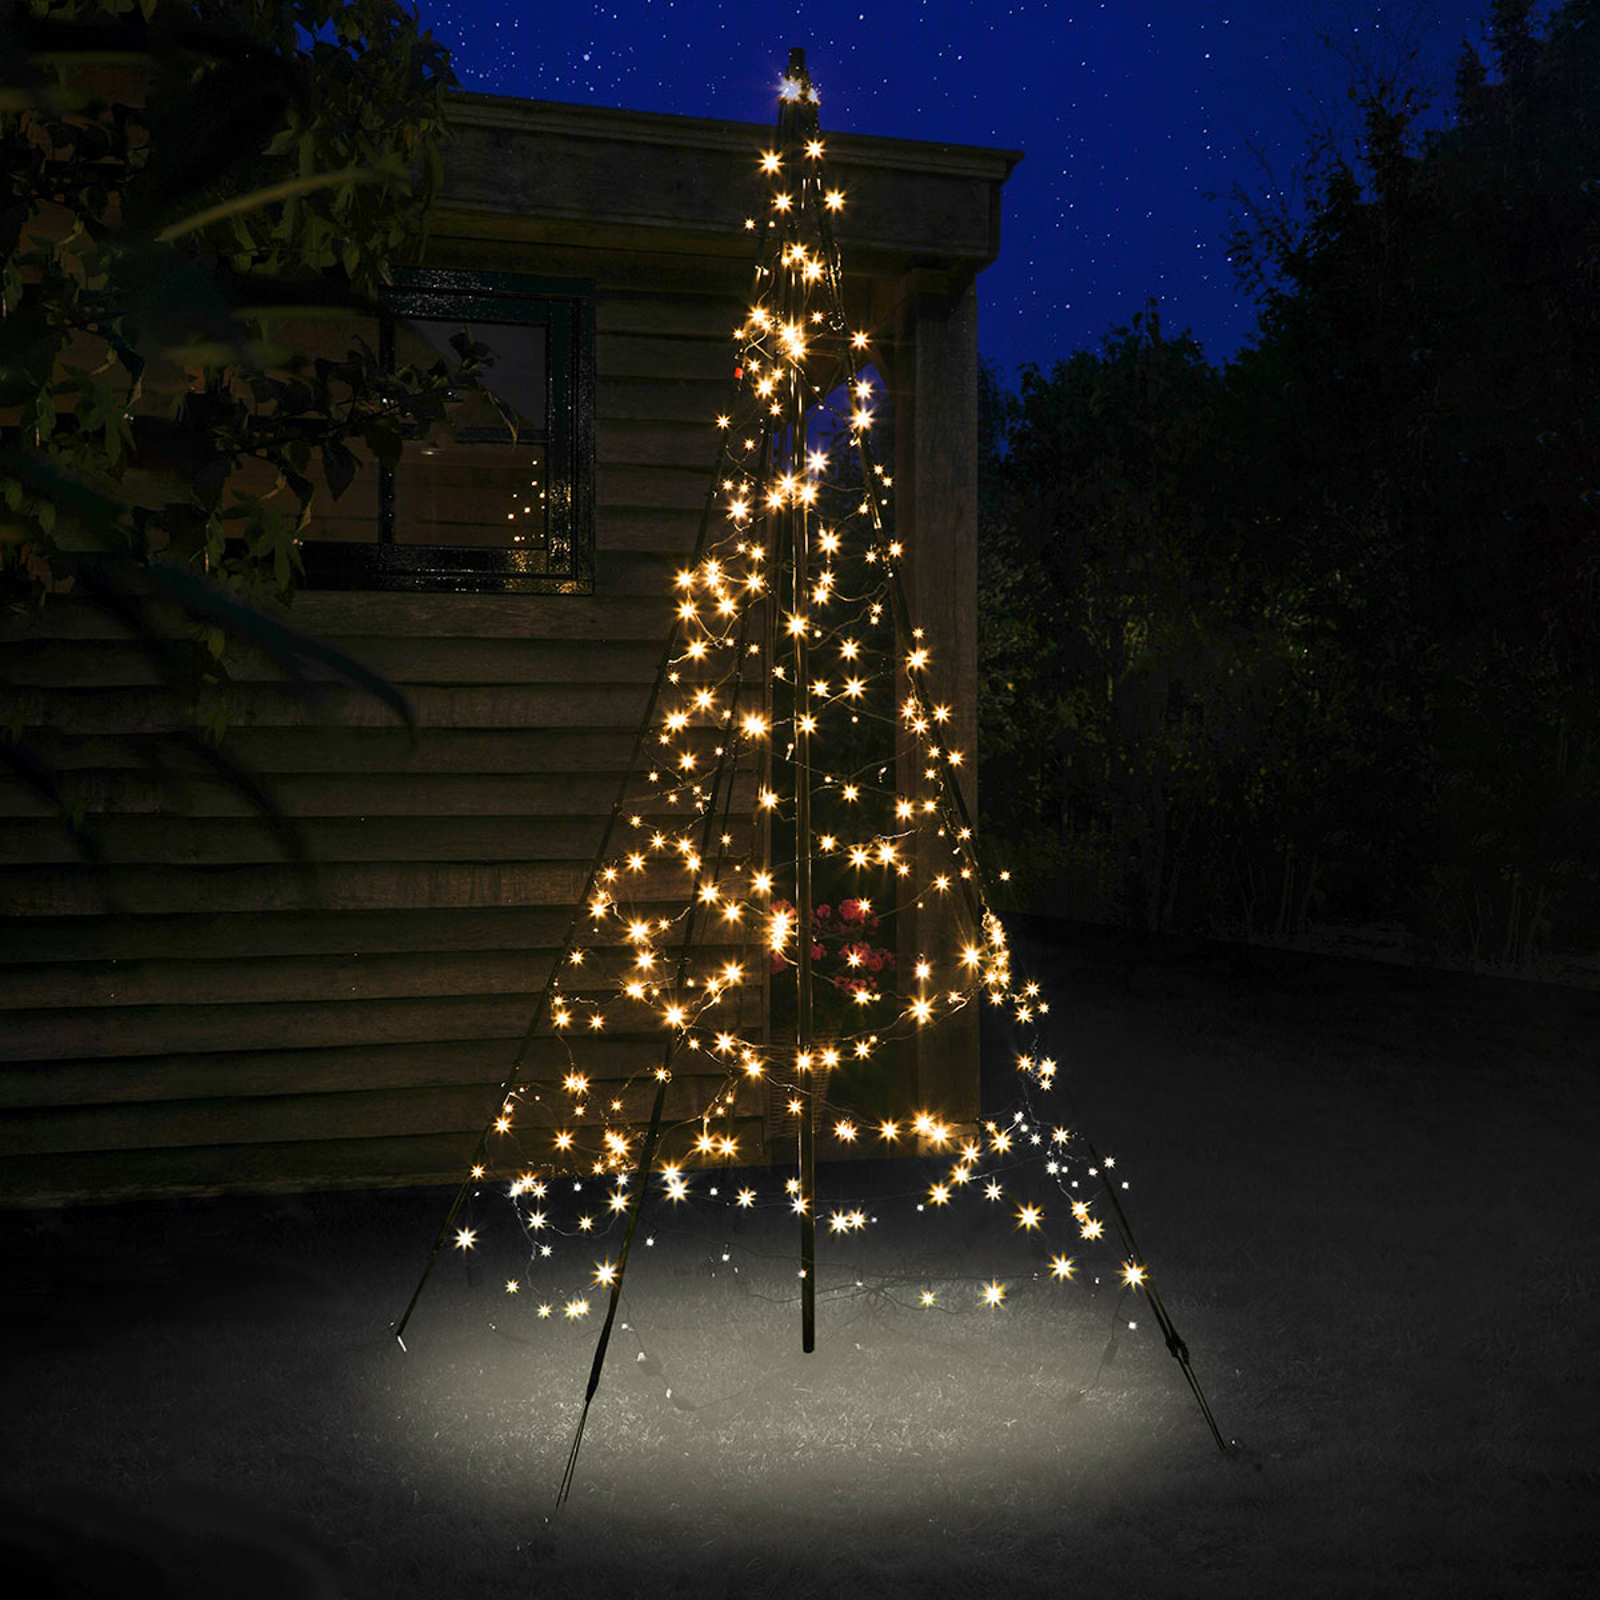 Midterstang - Fairybell® juletræ 2 m 300 lyskilder